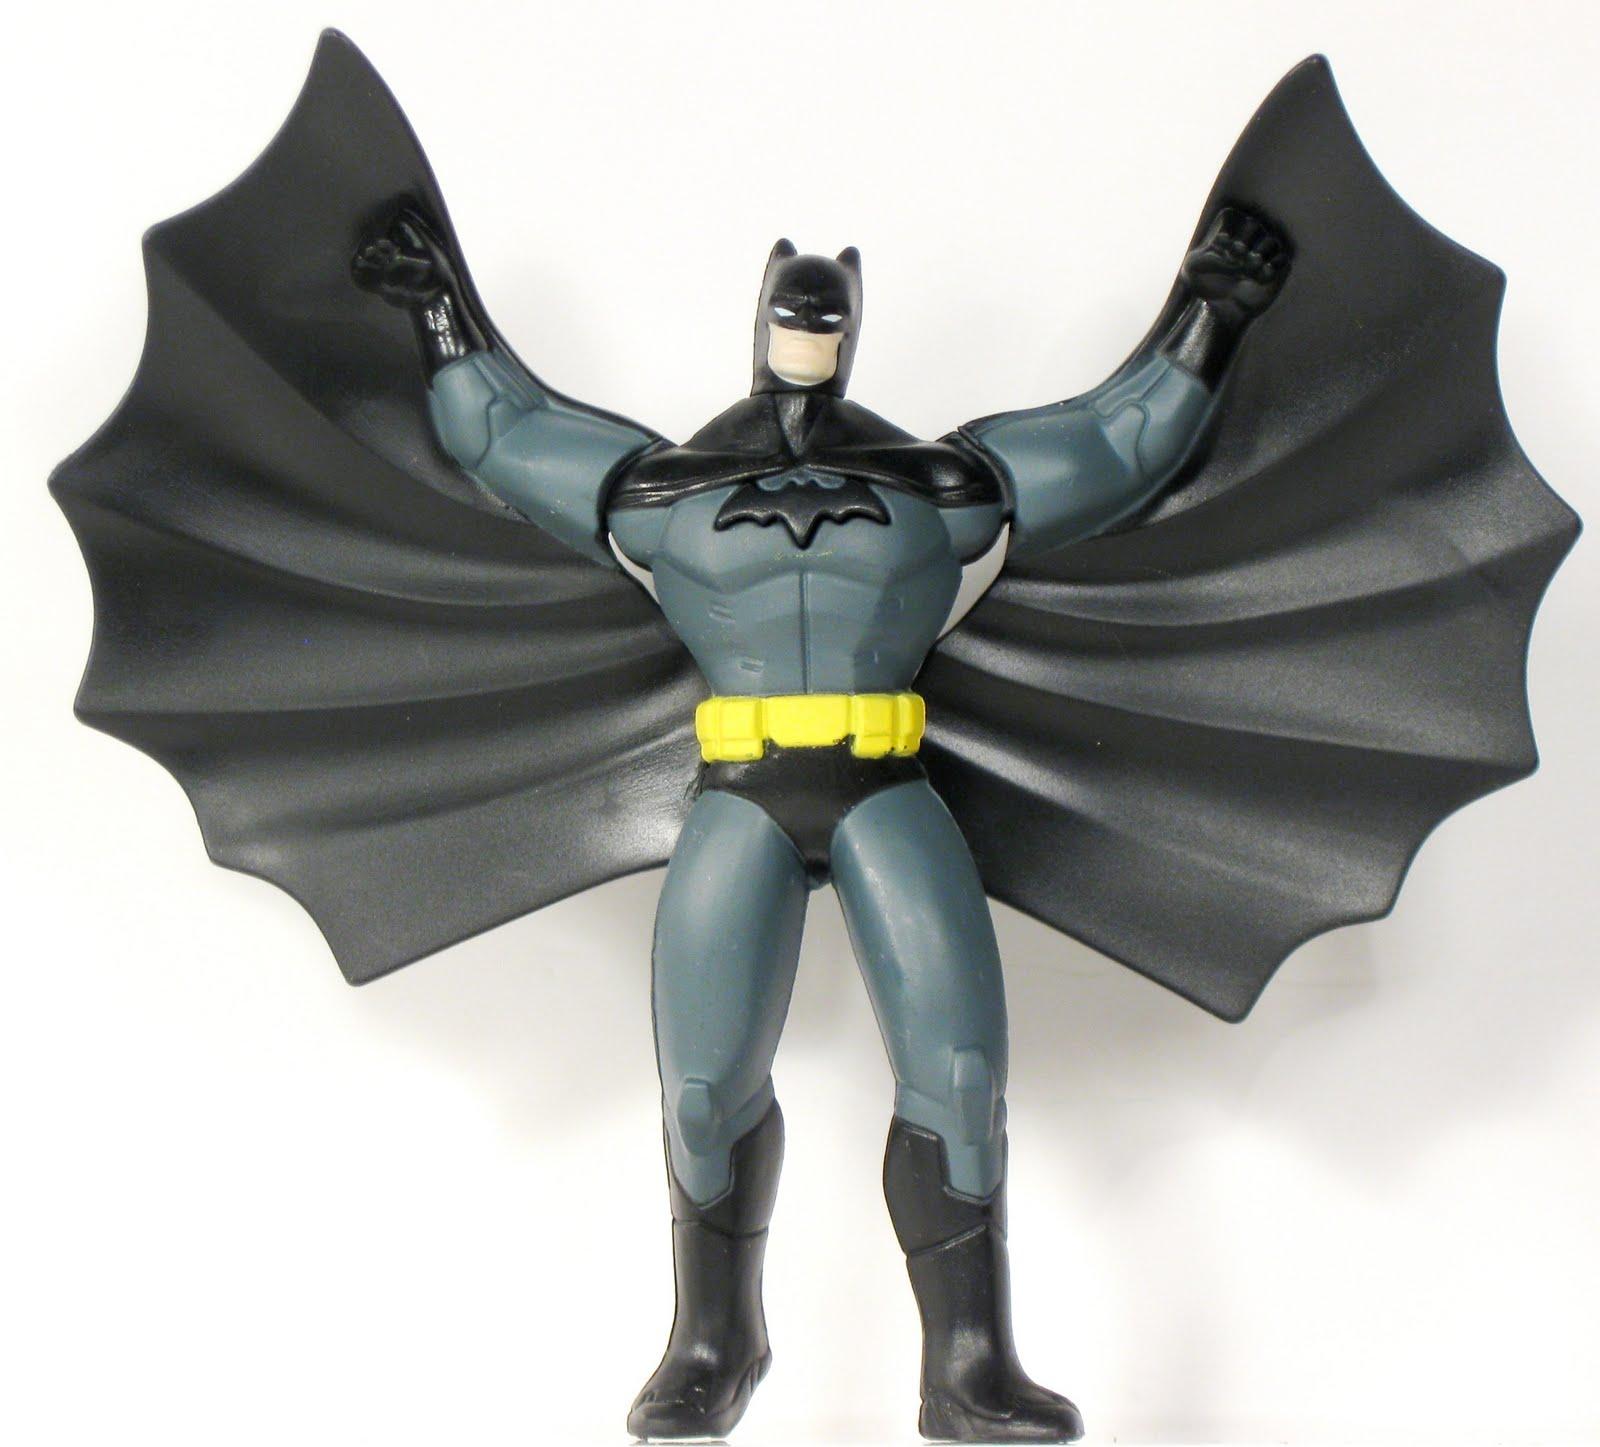 http://3.bp.blogspot.com/-RFBRJUYUSqU/TfTUkPQl1gI/AAAAAAAAB5g/hBNNW8jRBg4/s1600/McDonald%2527s+2011+Young+Justice+%25232+Batman+4.JPG